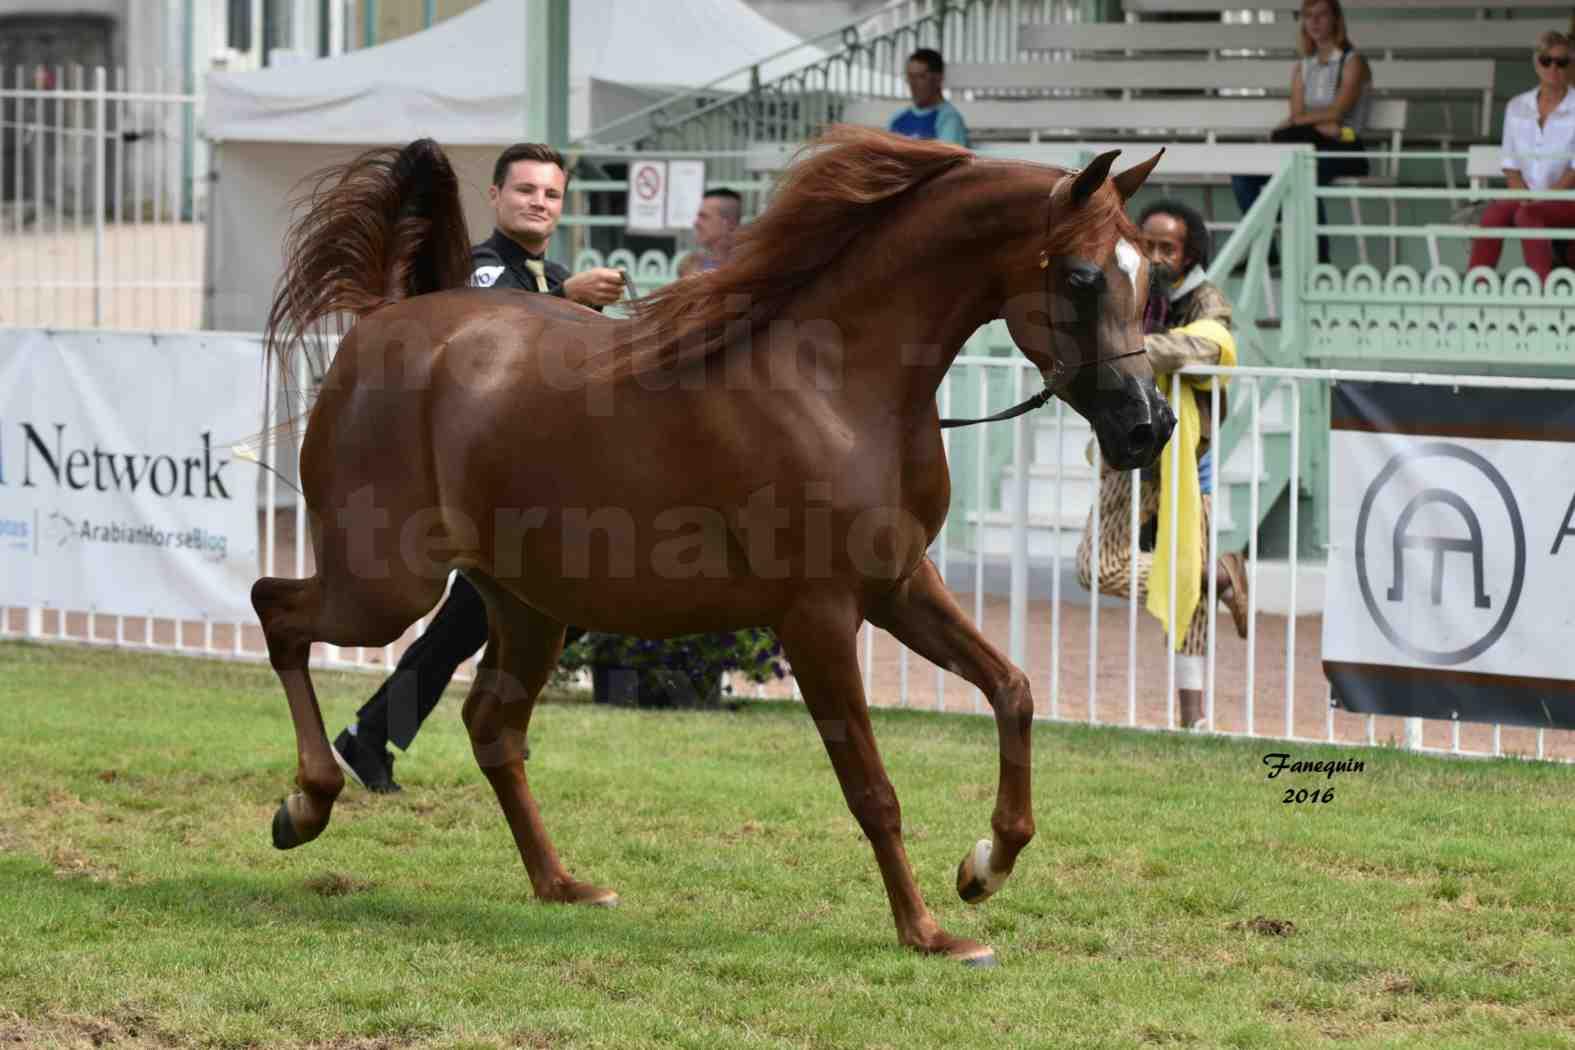 International Arabian Horse Show B de VICHY 2016 - PEARL DE DJOON - Notre Sélection - 30